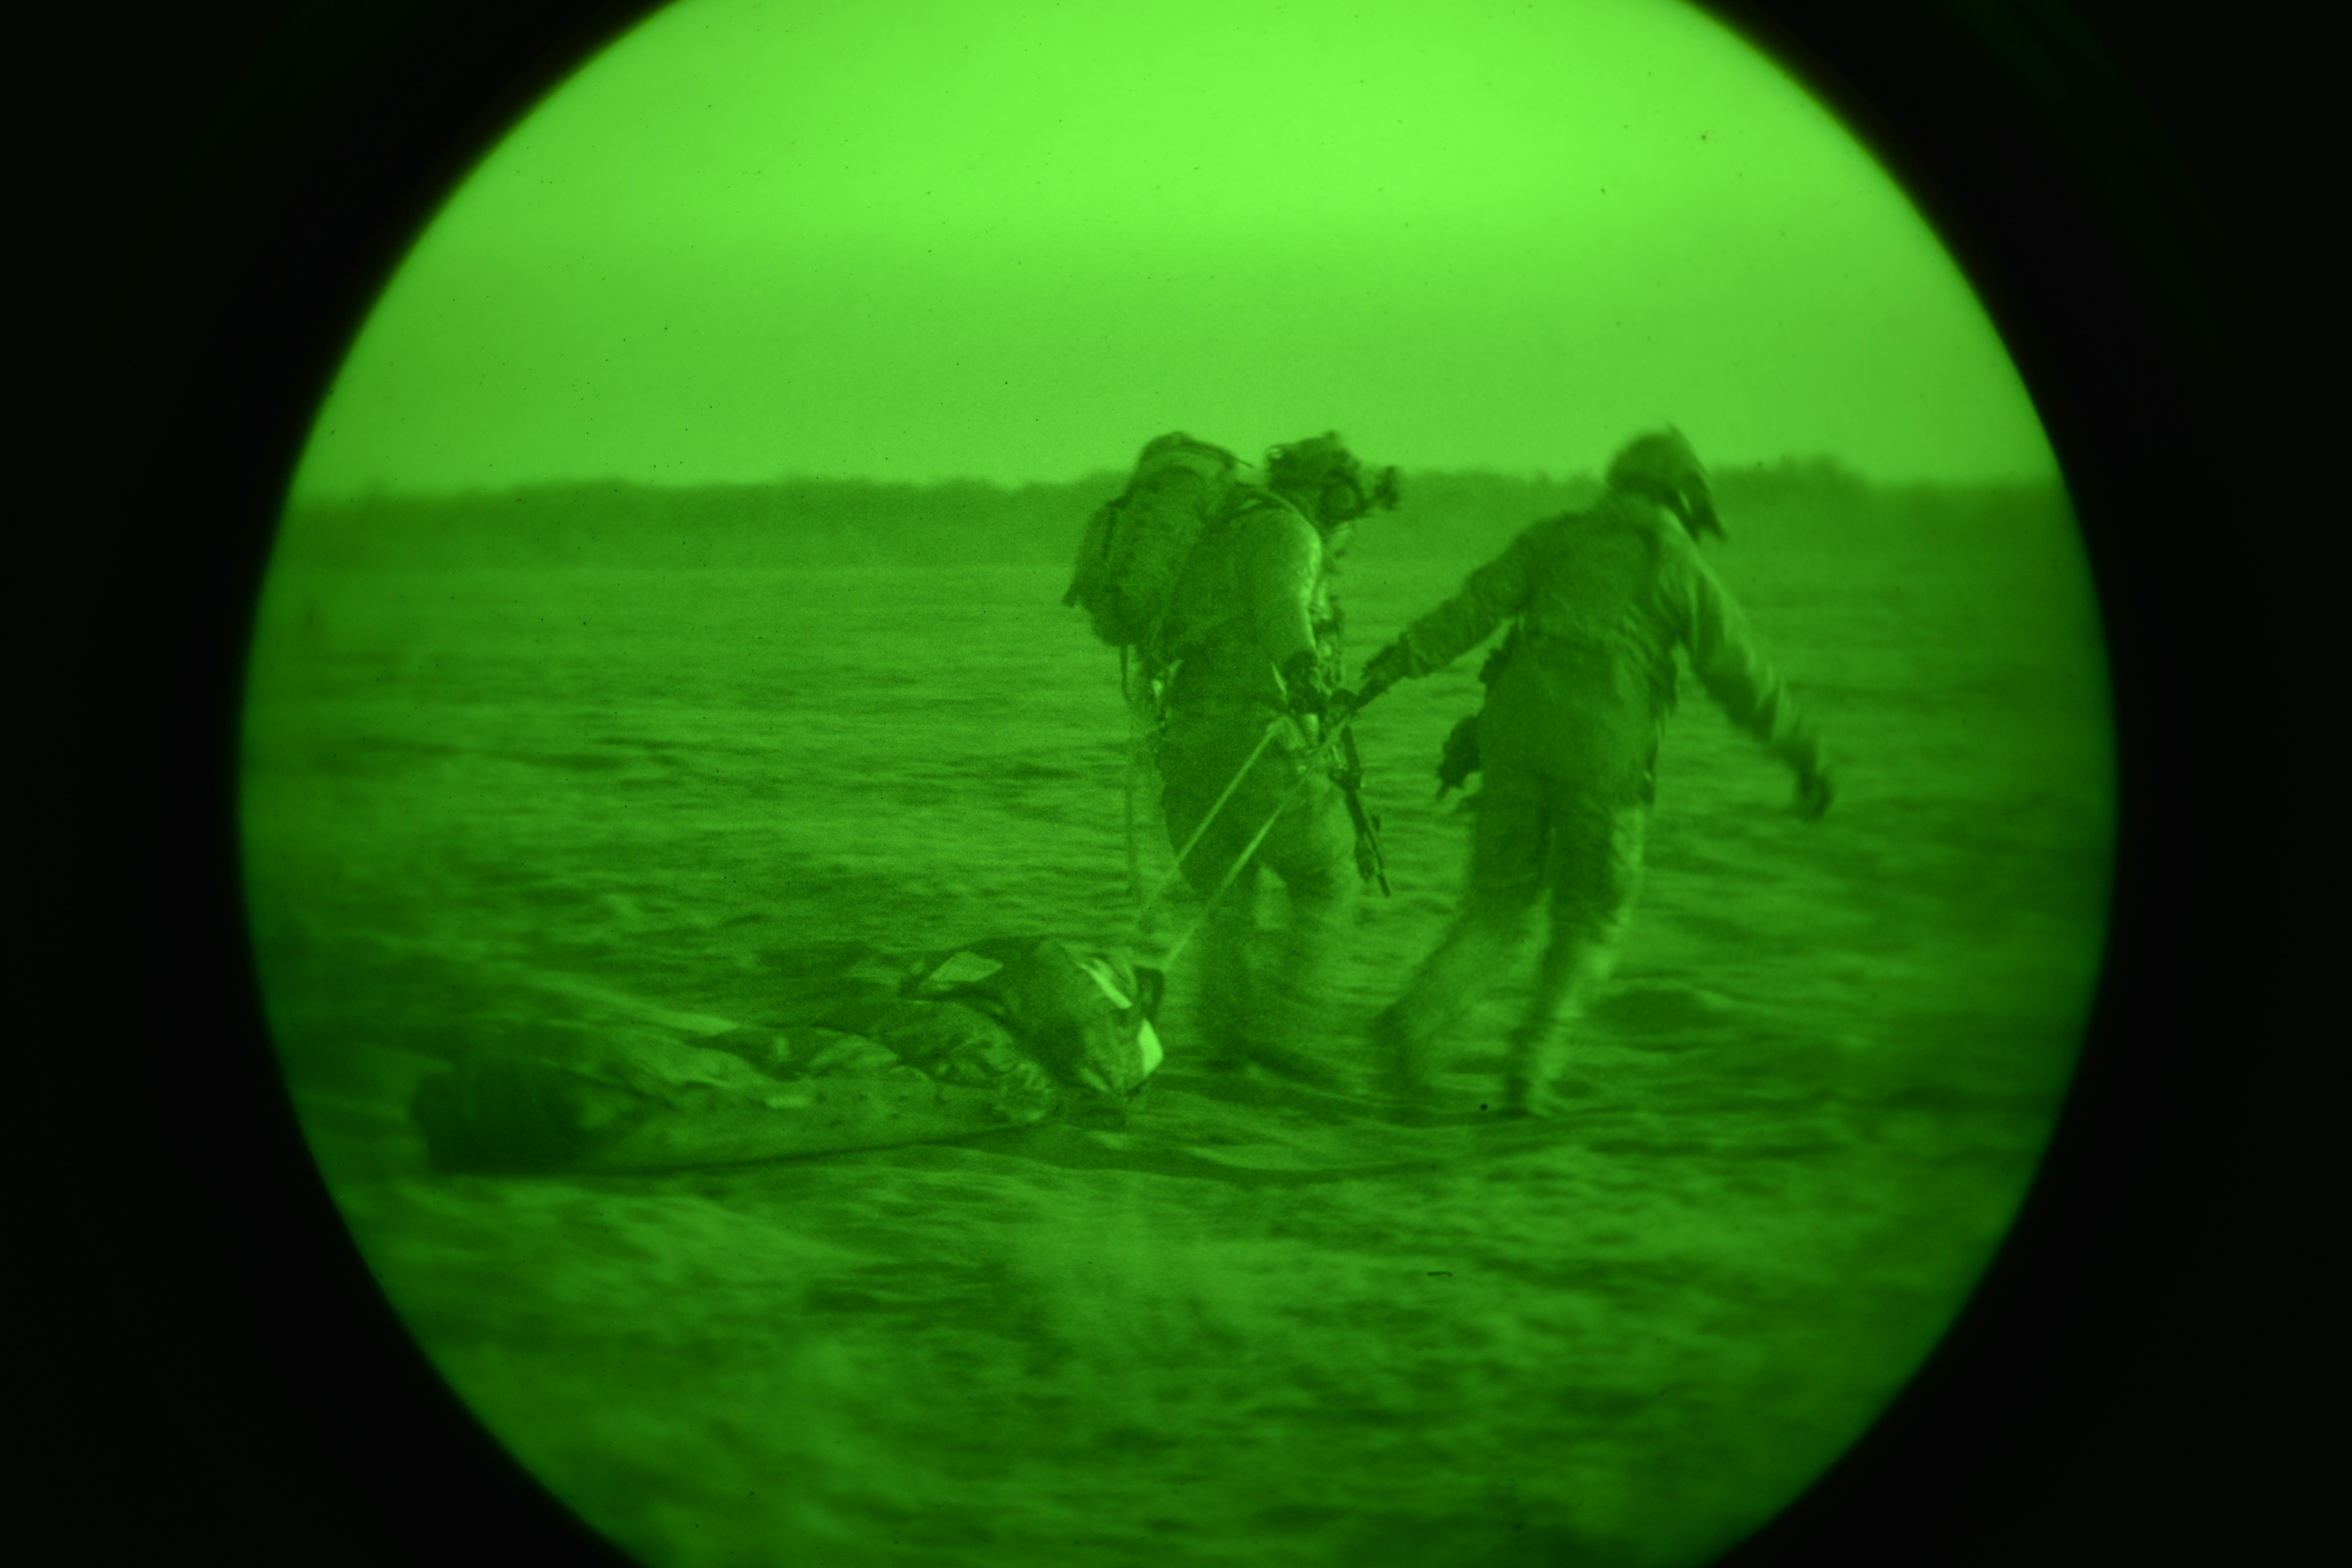 US SOF continue to enhance ability alongside POL allies